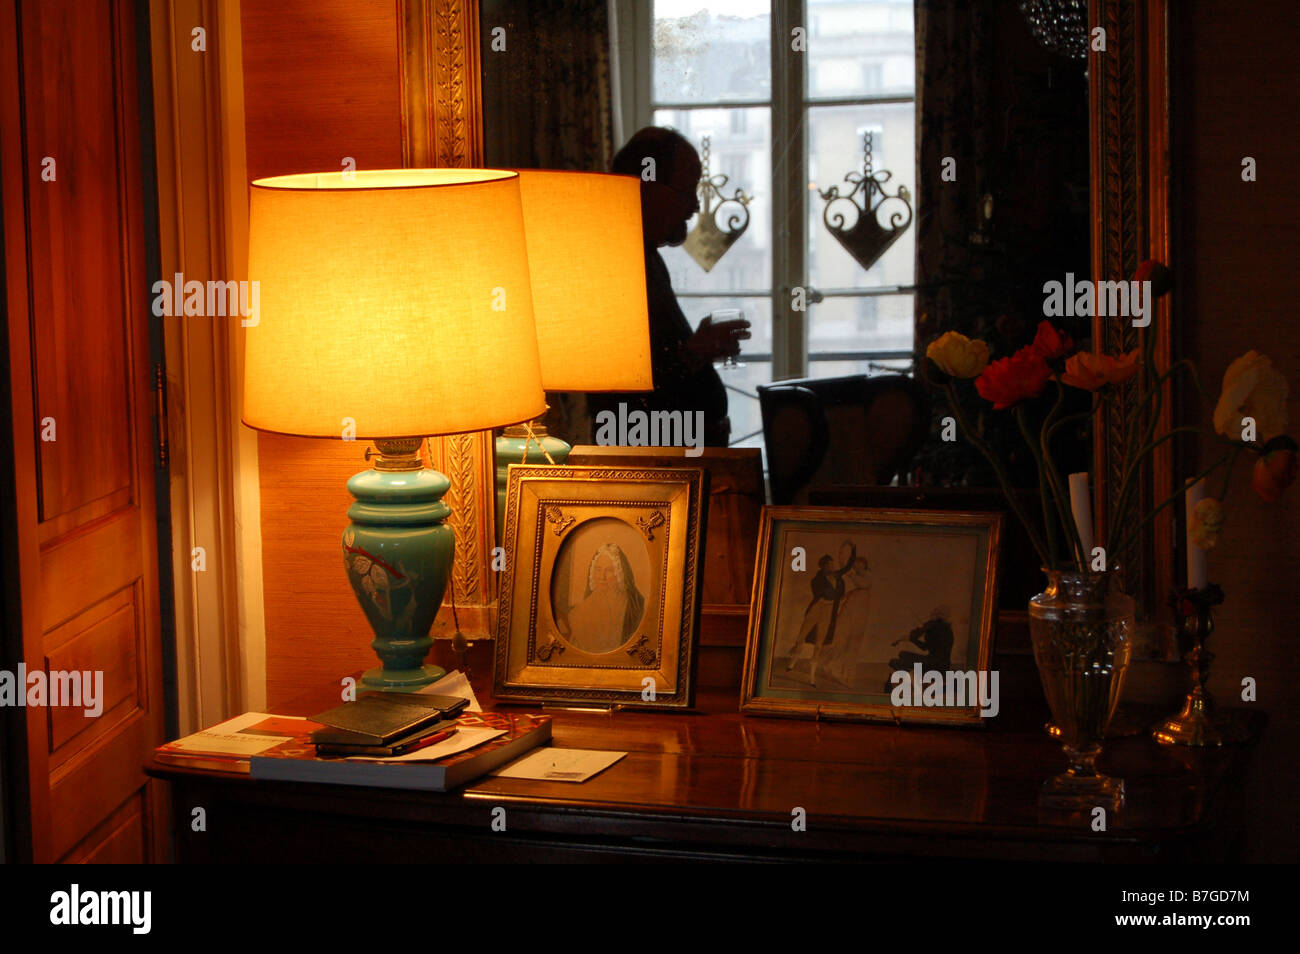 Interior of a flat in Paris Stock Photo